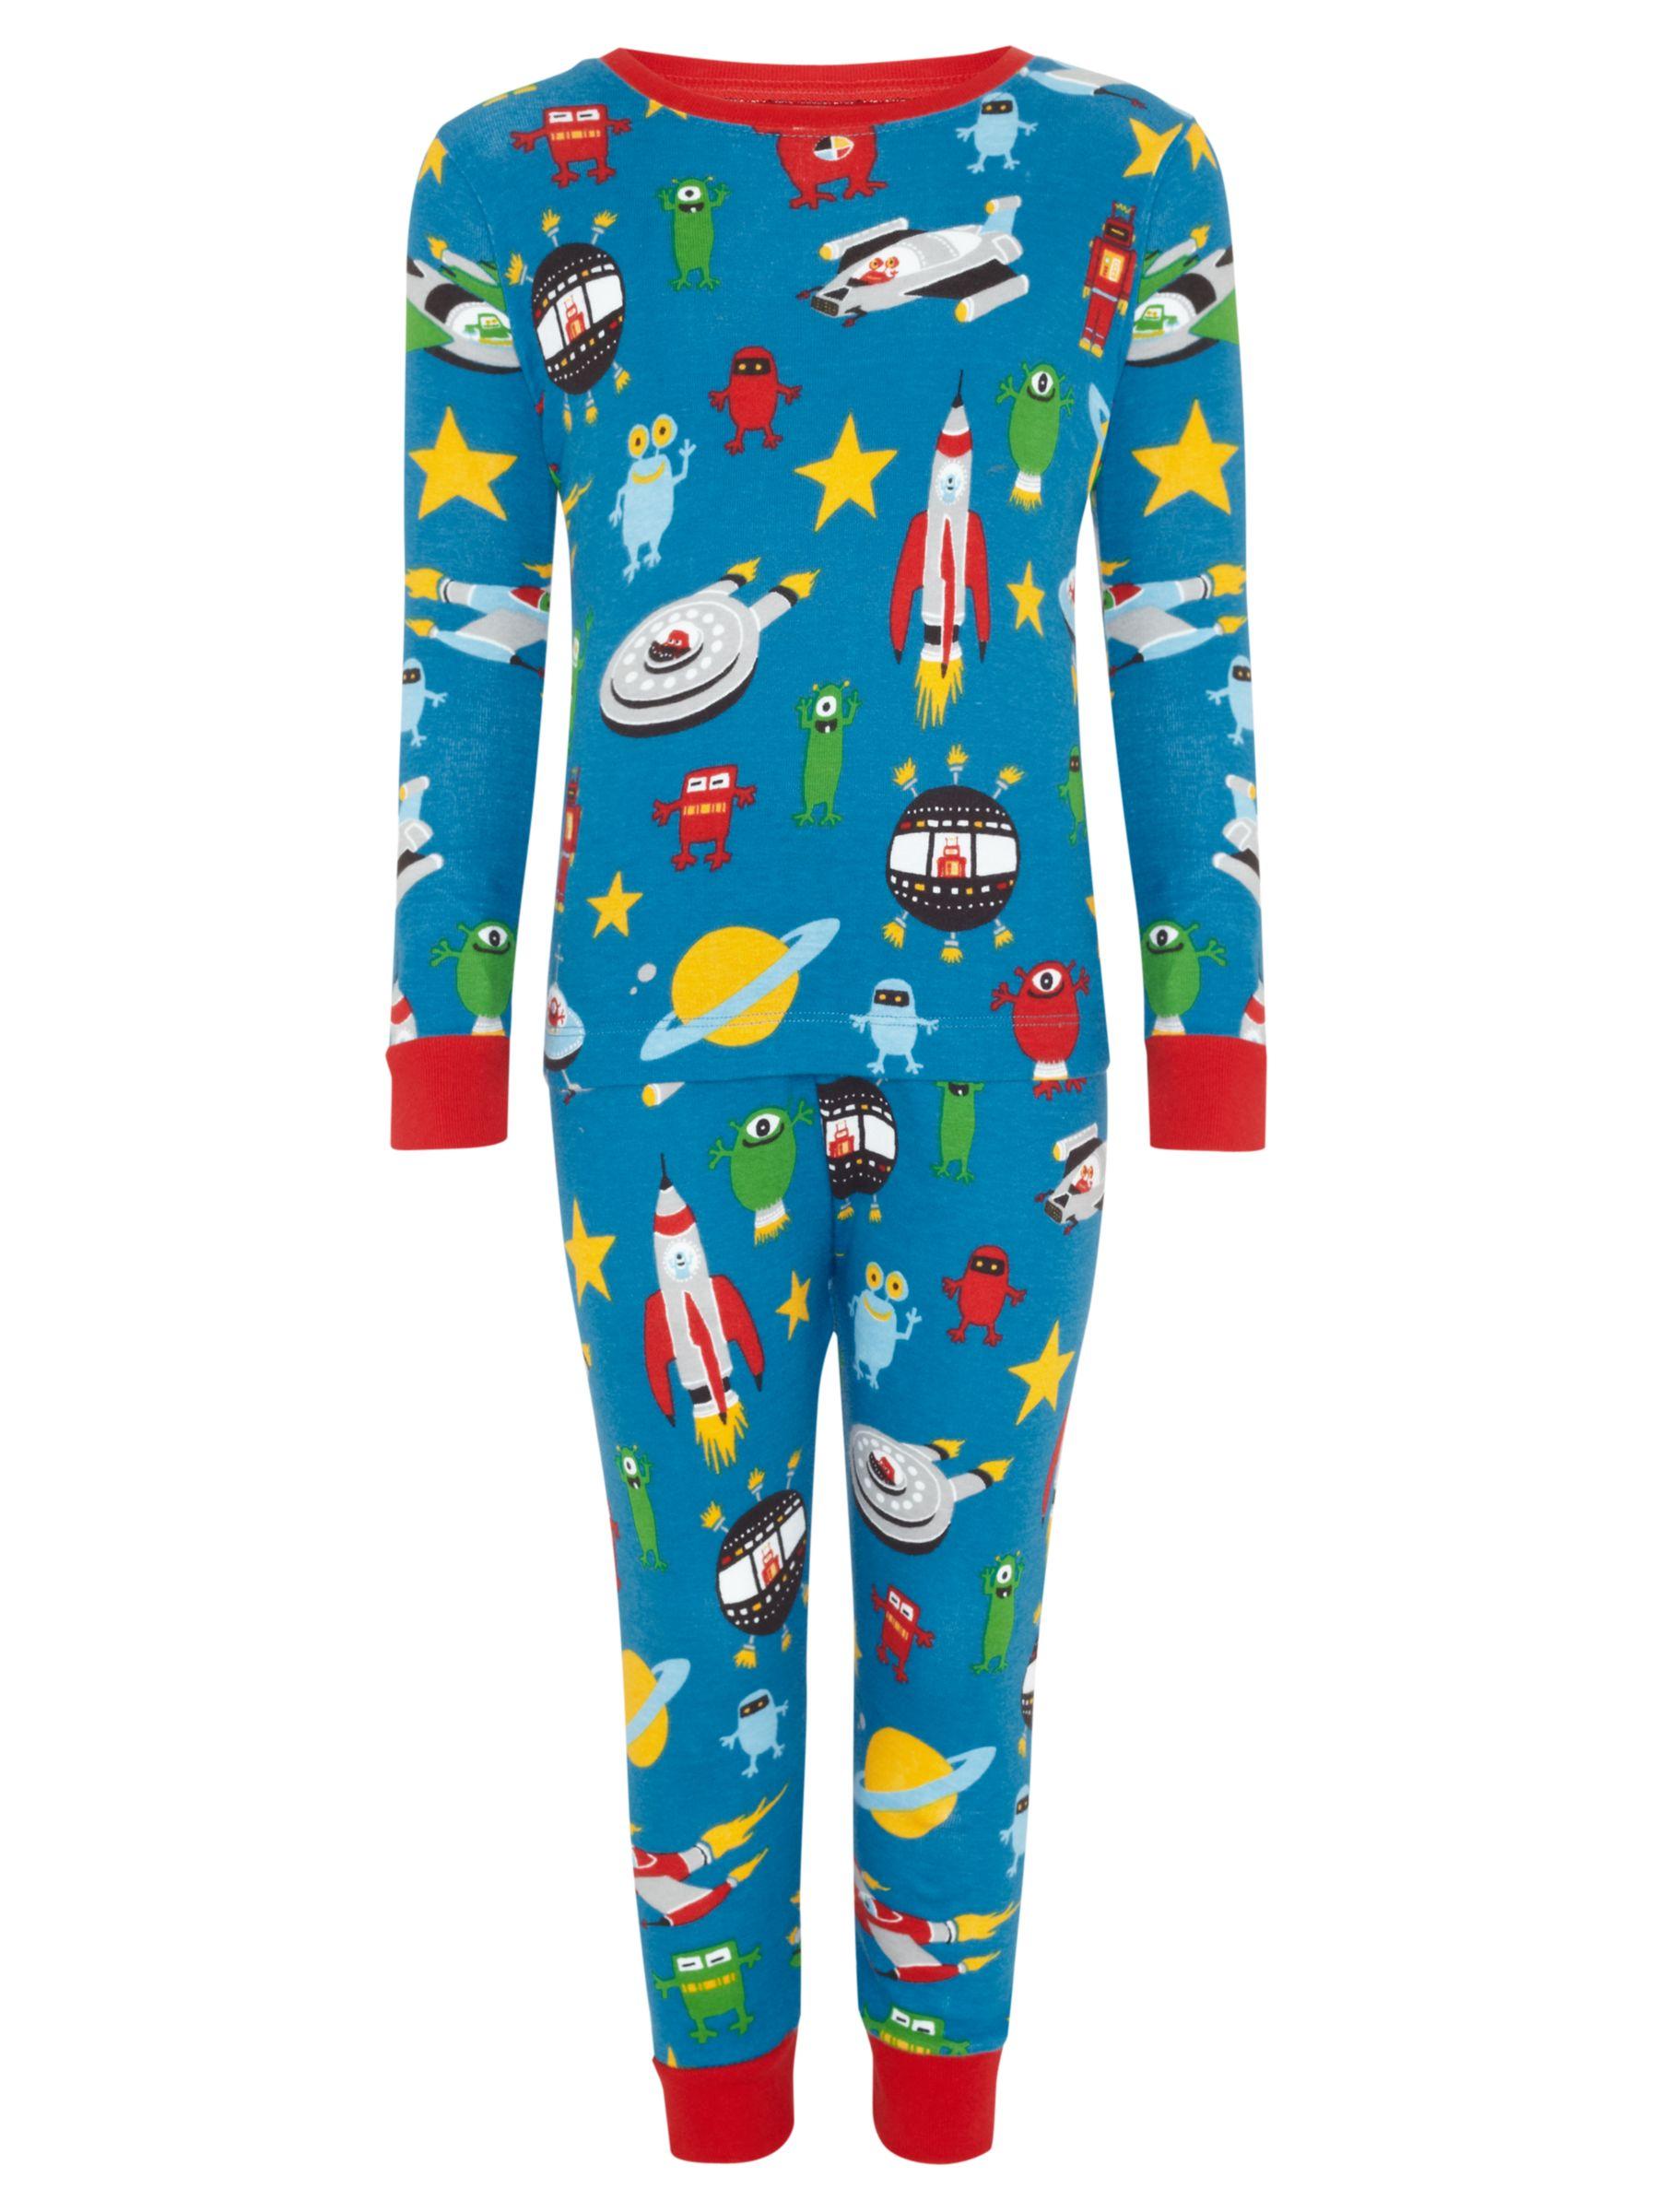 Hatley Boys' Spaceship Print Pyjamas, Blue/Multi